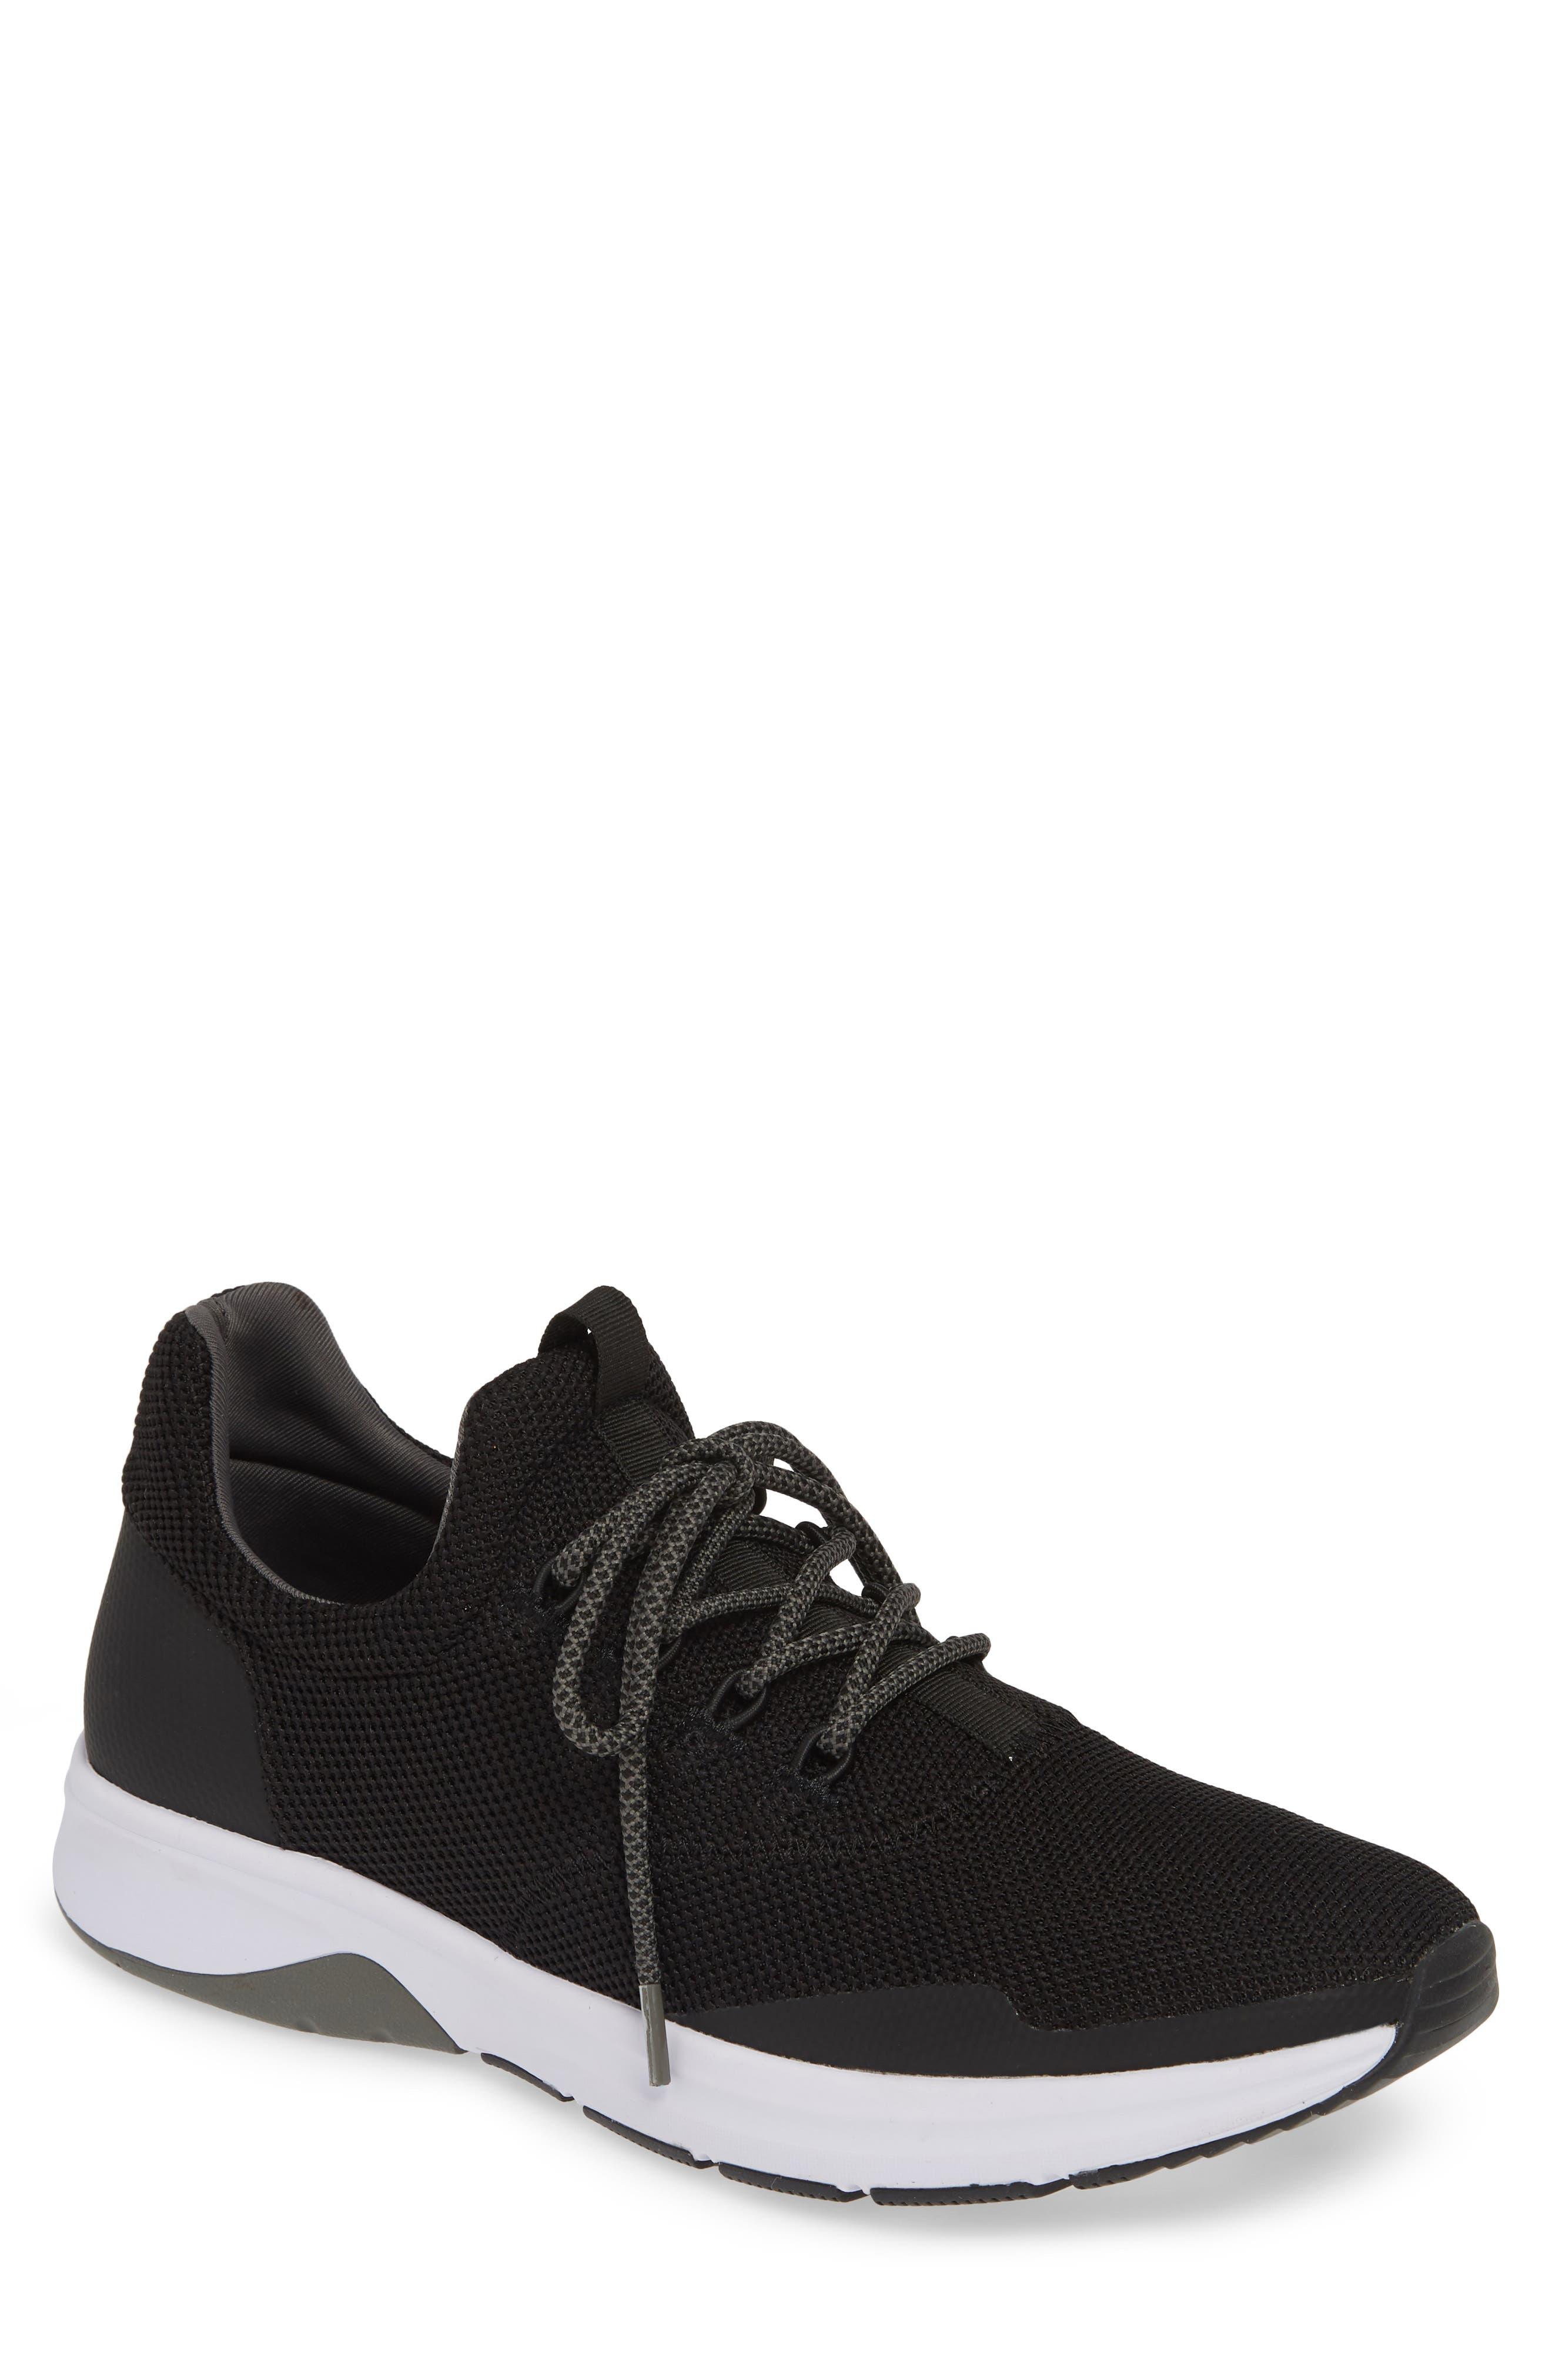 THE RAIL Axel Sneaker, Main, color, BLACK